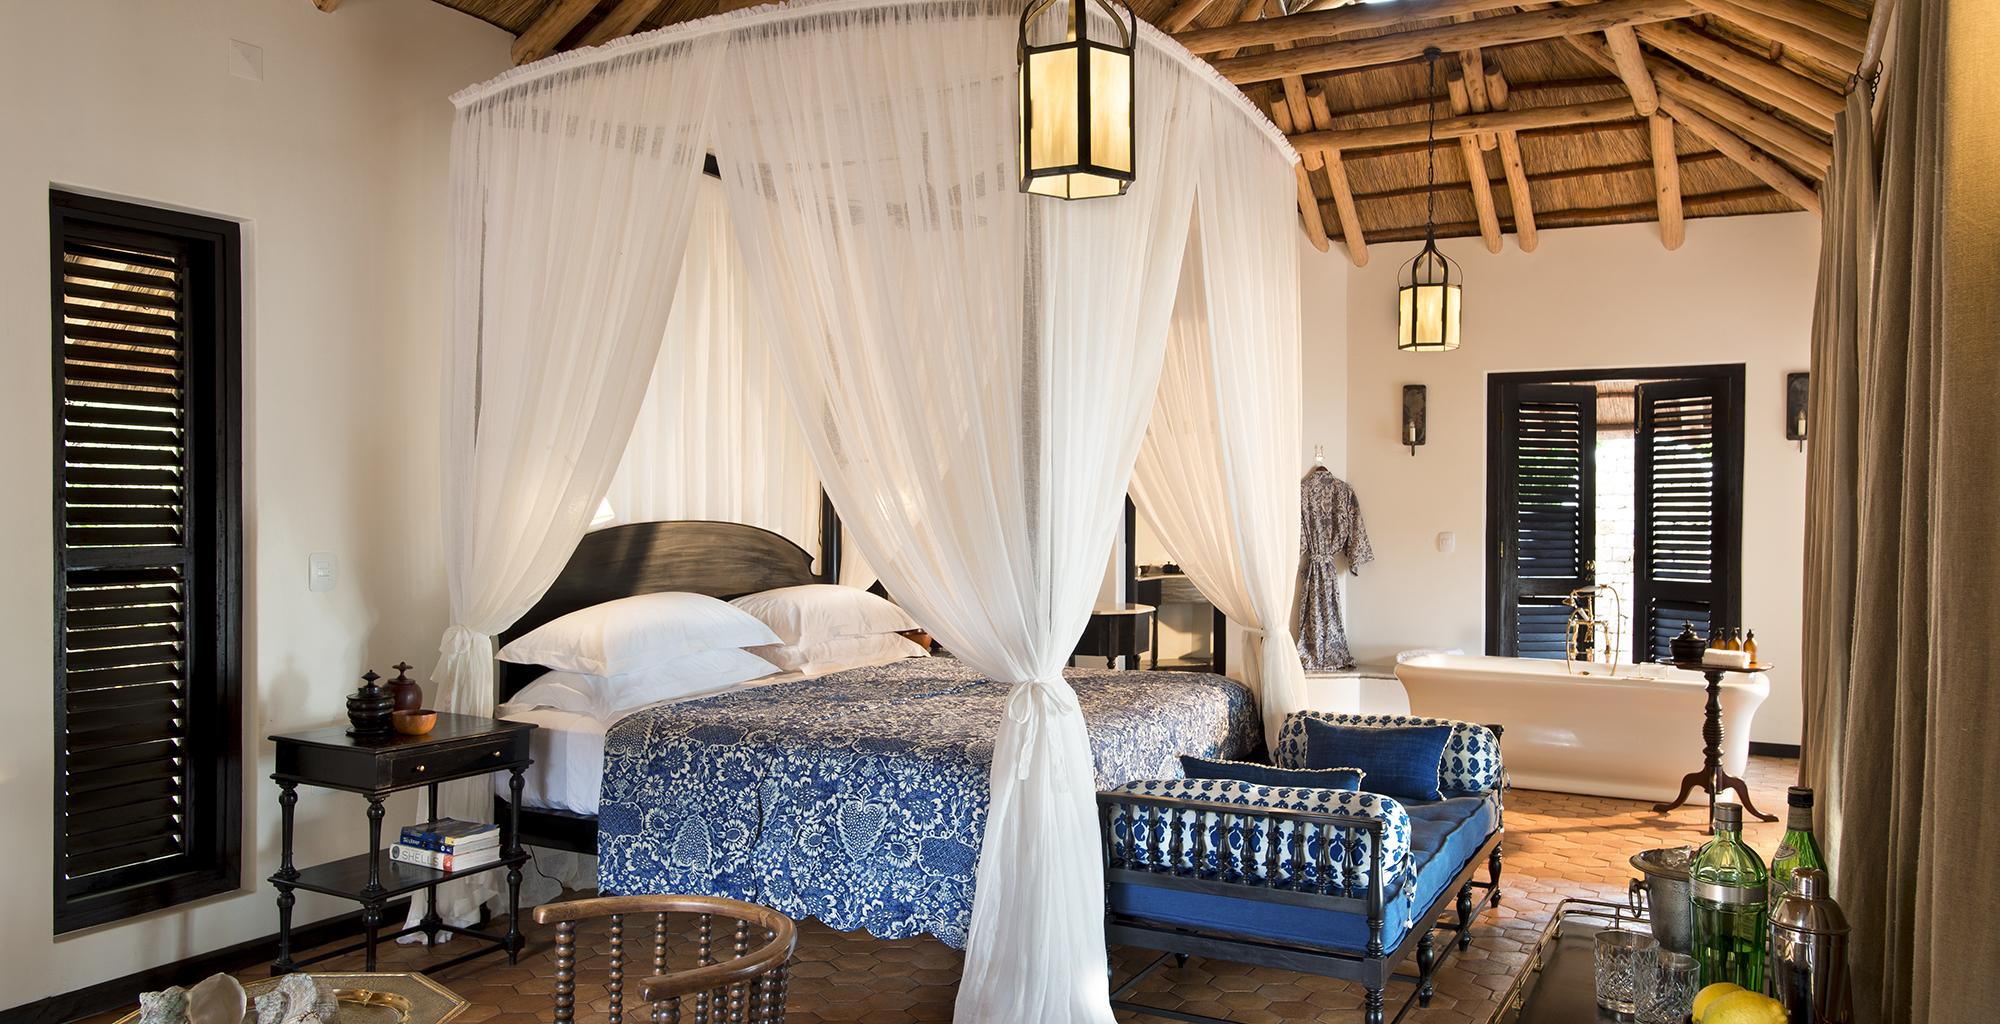 Mozambique-Bazaruto-Archipelago-Benguerra-Island-Lodge-Bedroom